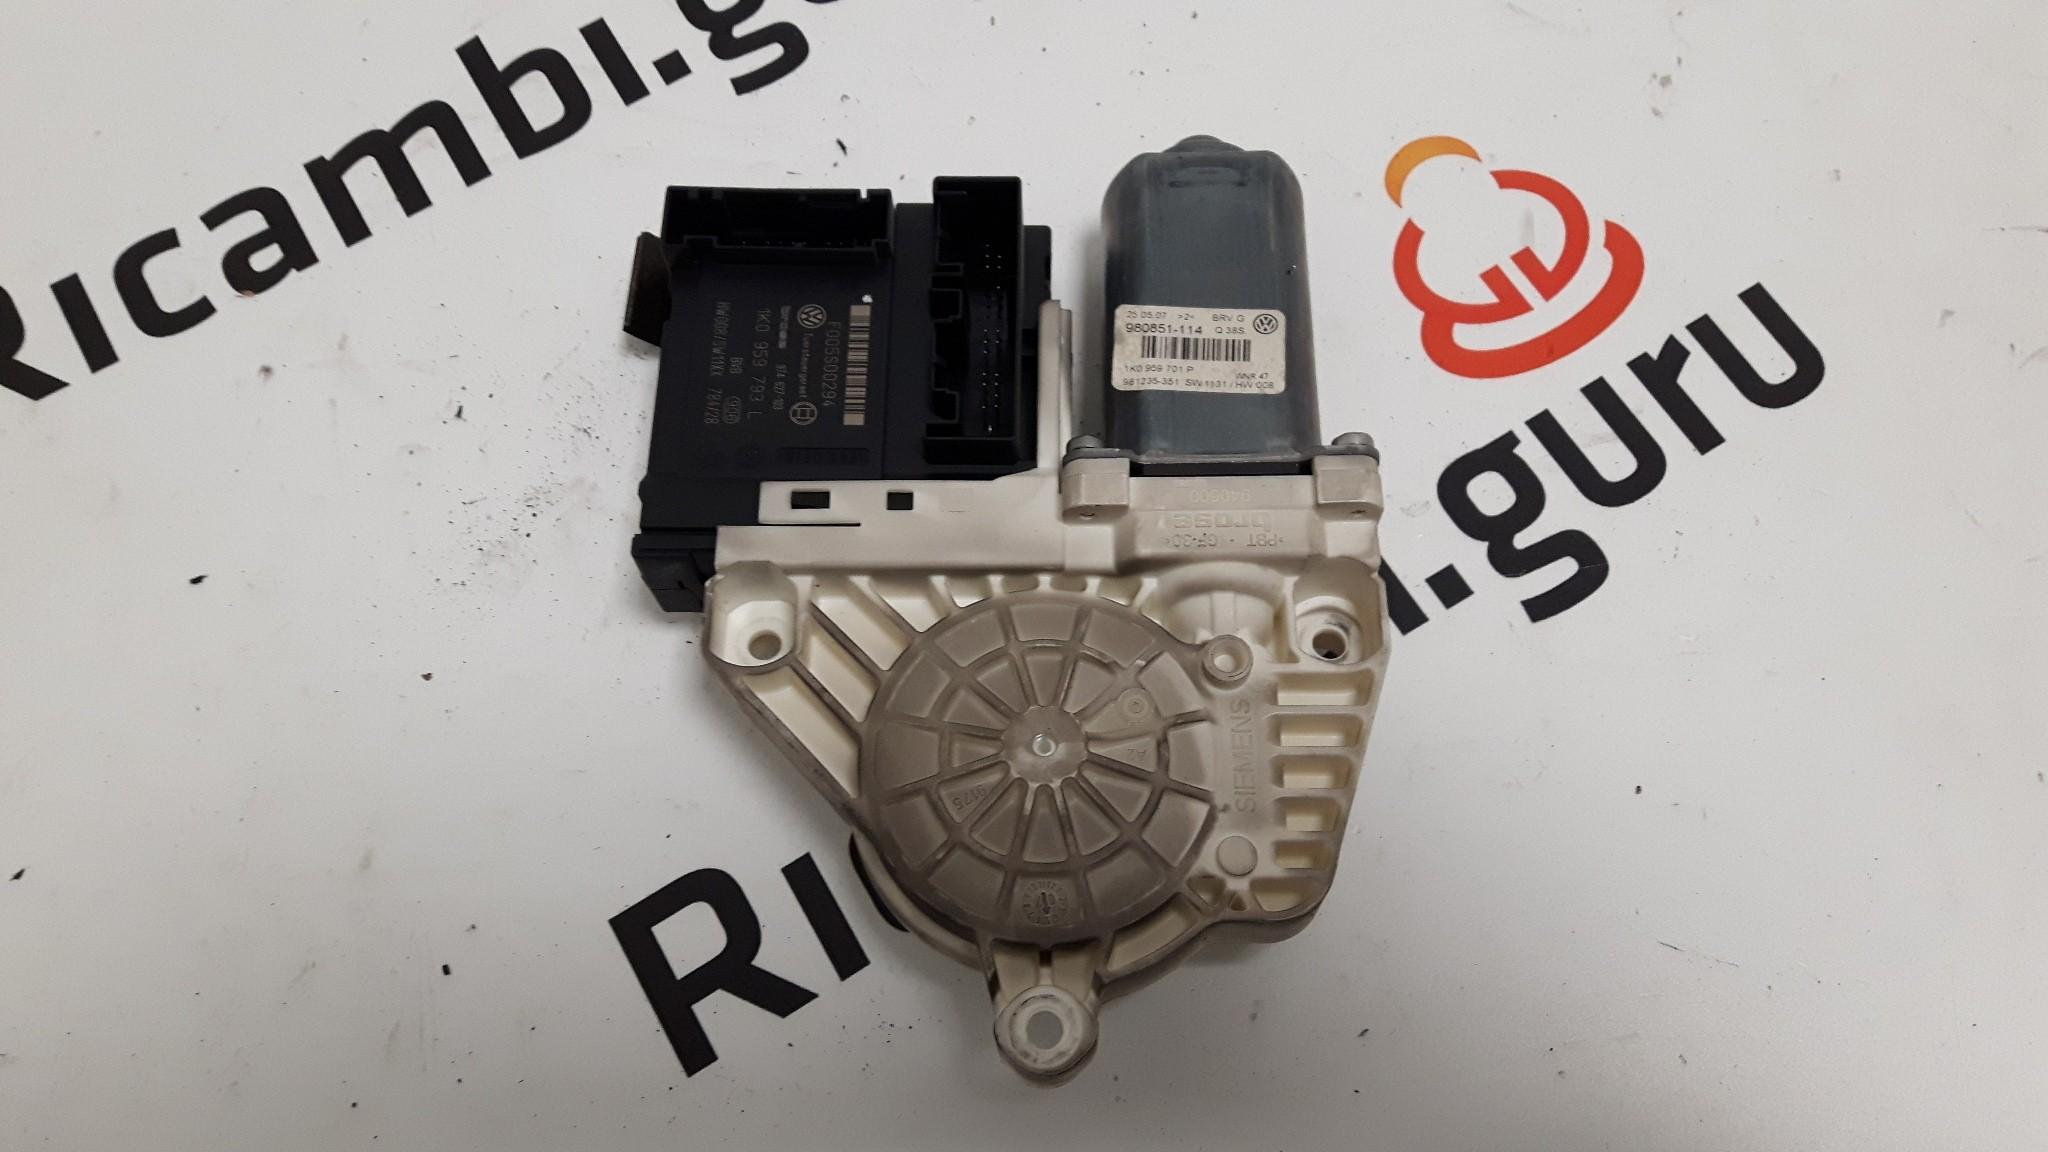 Motorino alzacristallo Anteriore Sinistro Volkswagen passat